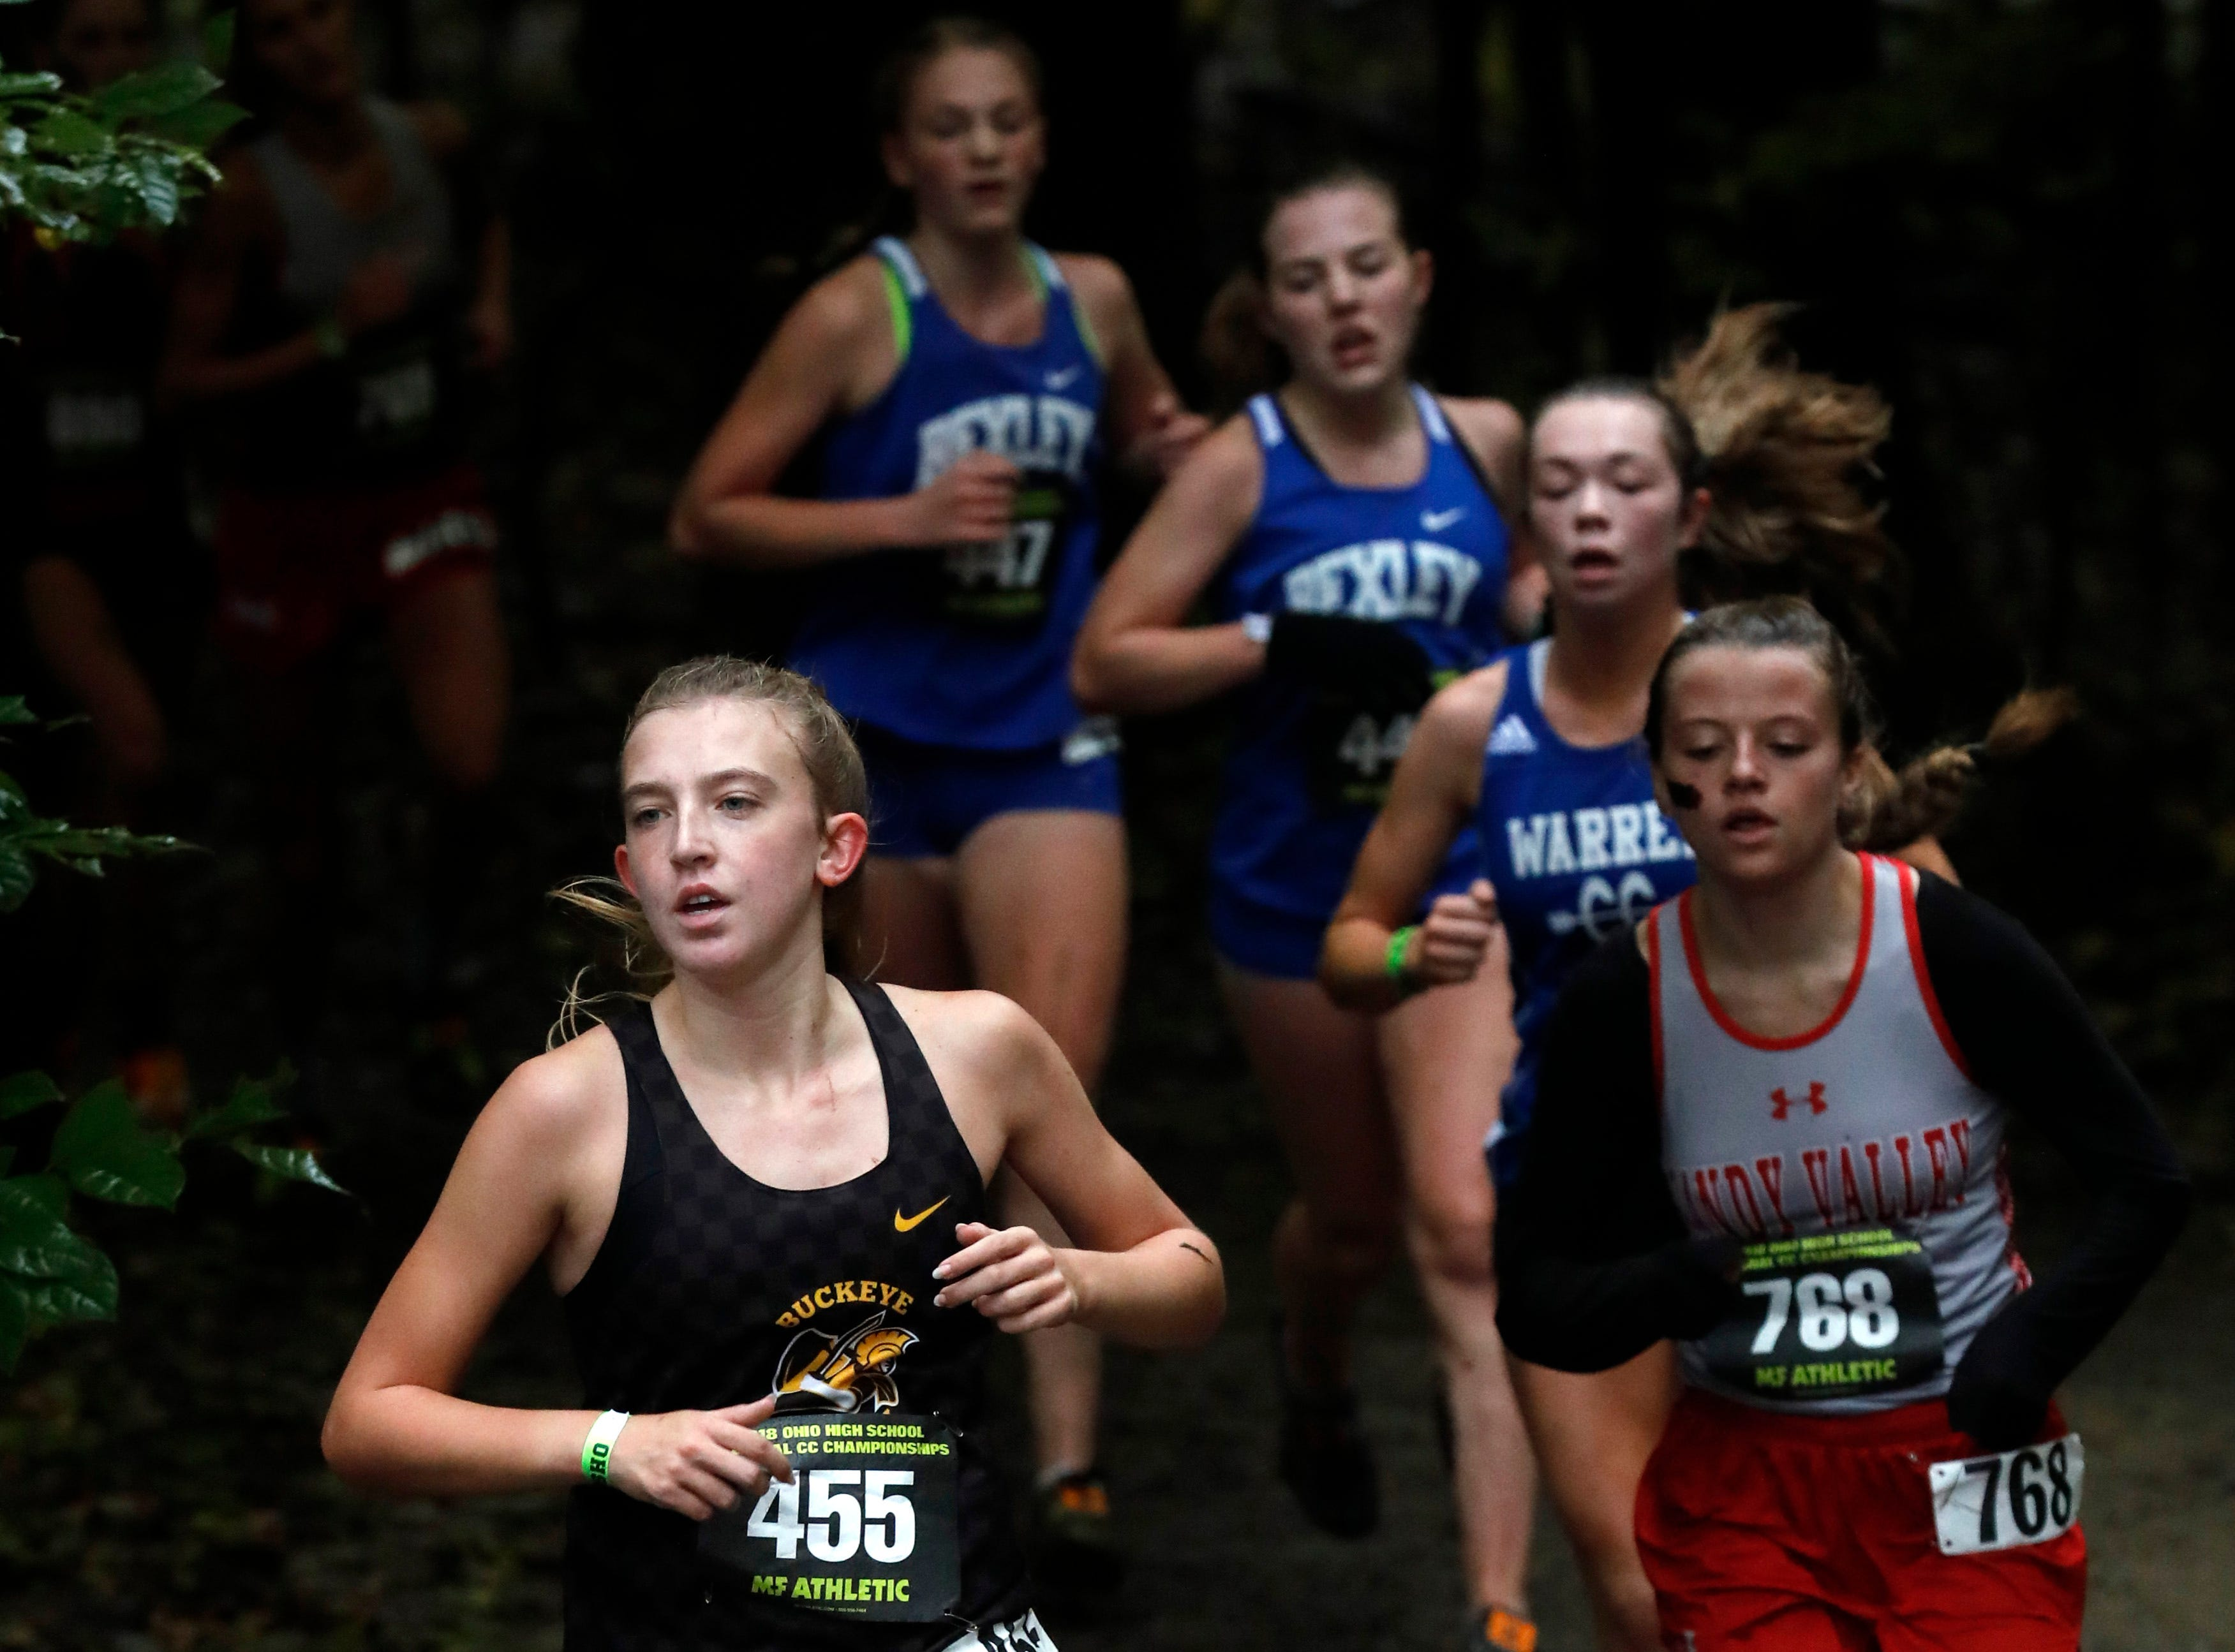 Buckeye Valley's Chayse Arnhold runs in the Regional Cross Country meet Saturday, Oct. 27, 2018, at Pickerington North High School in Pickerington.